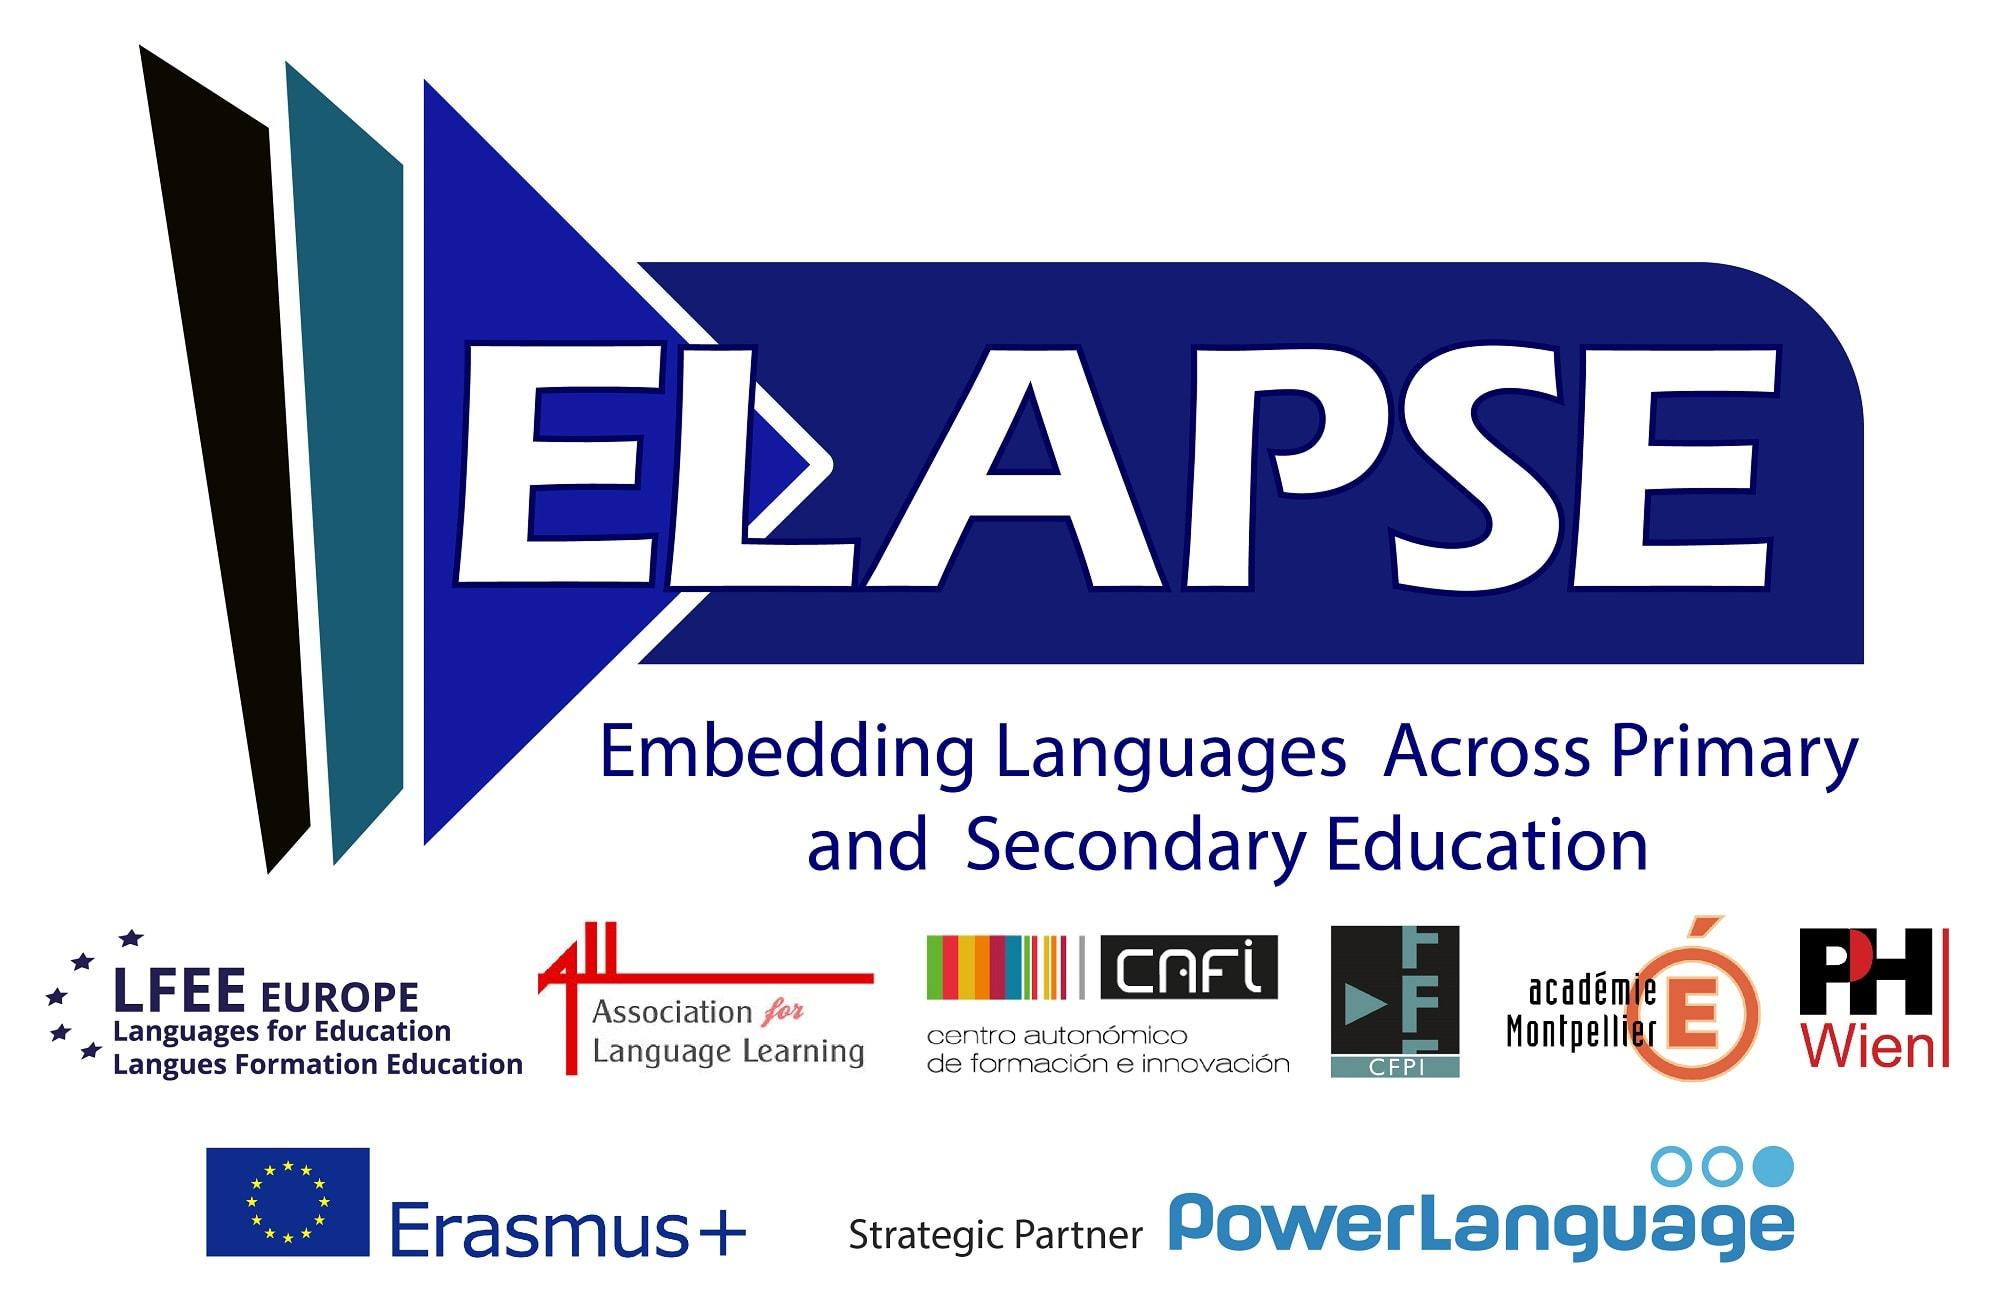 Elapse-Banner